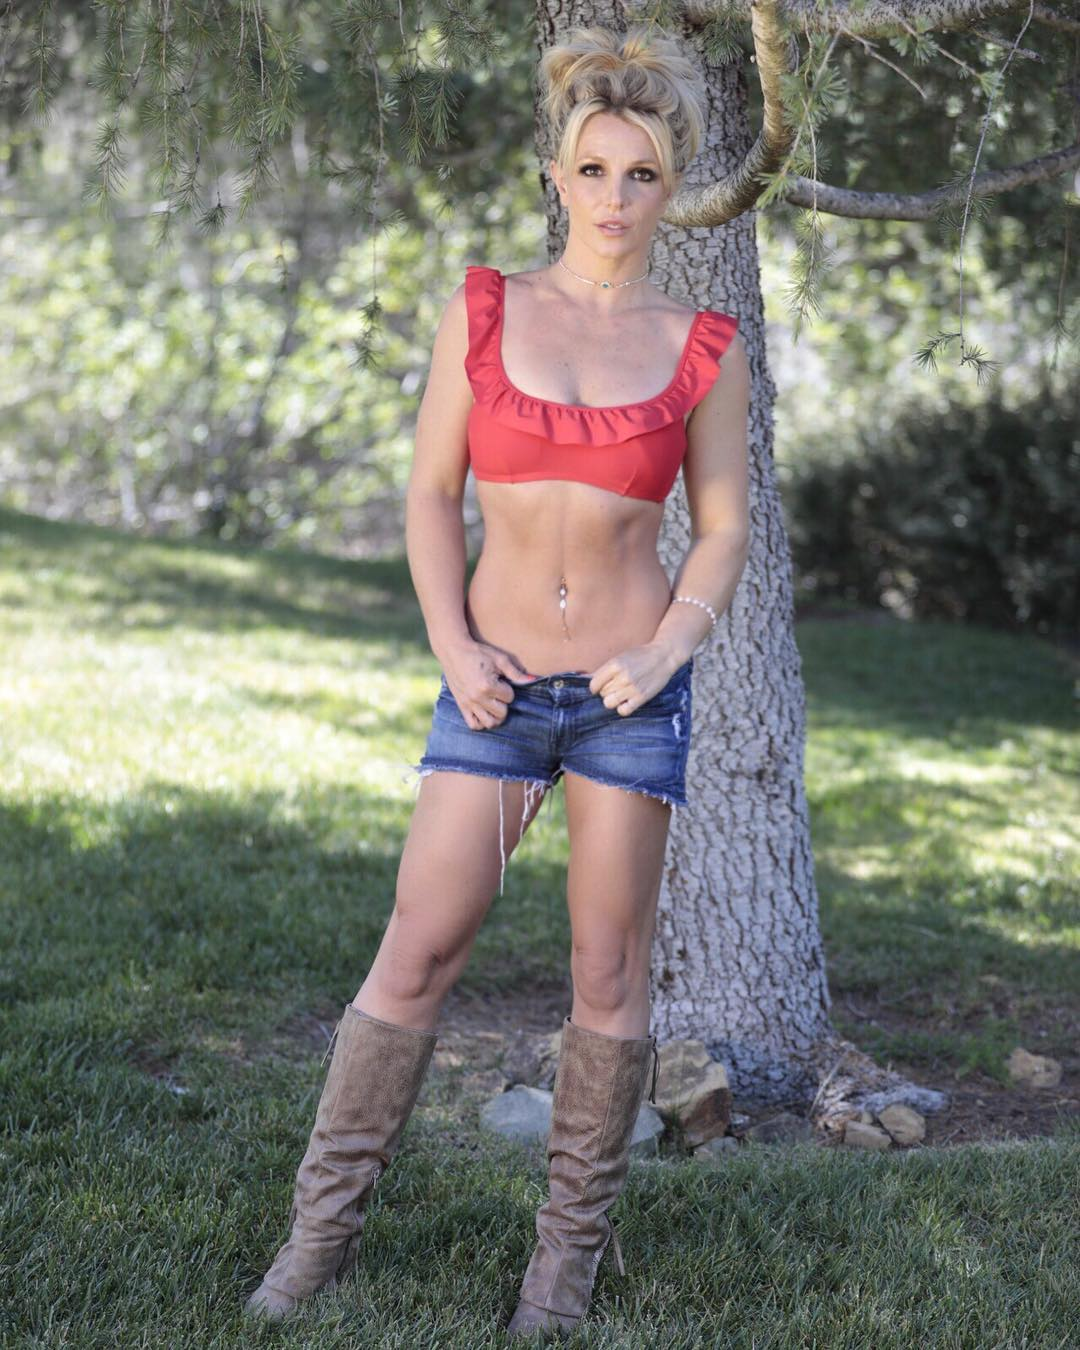 Britney Spears Hot Bikini Images